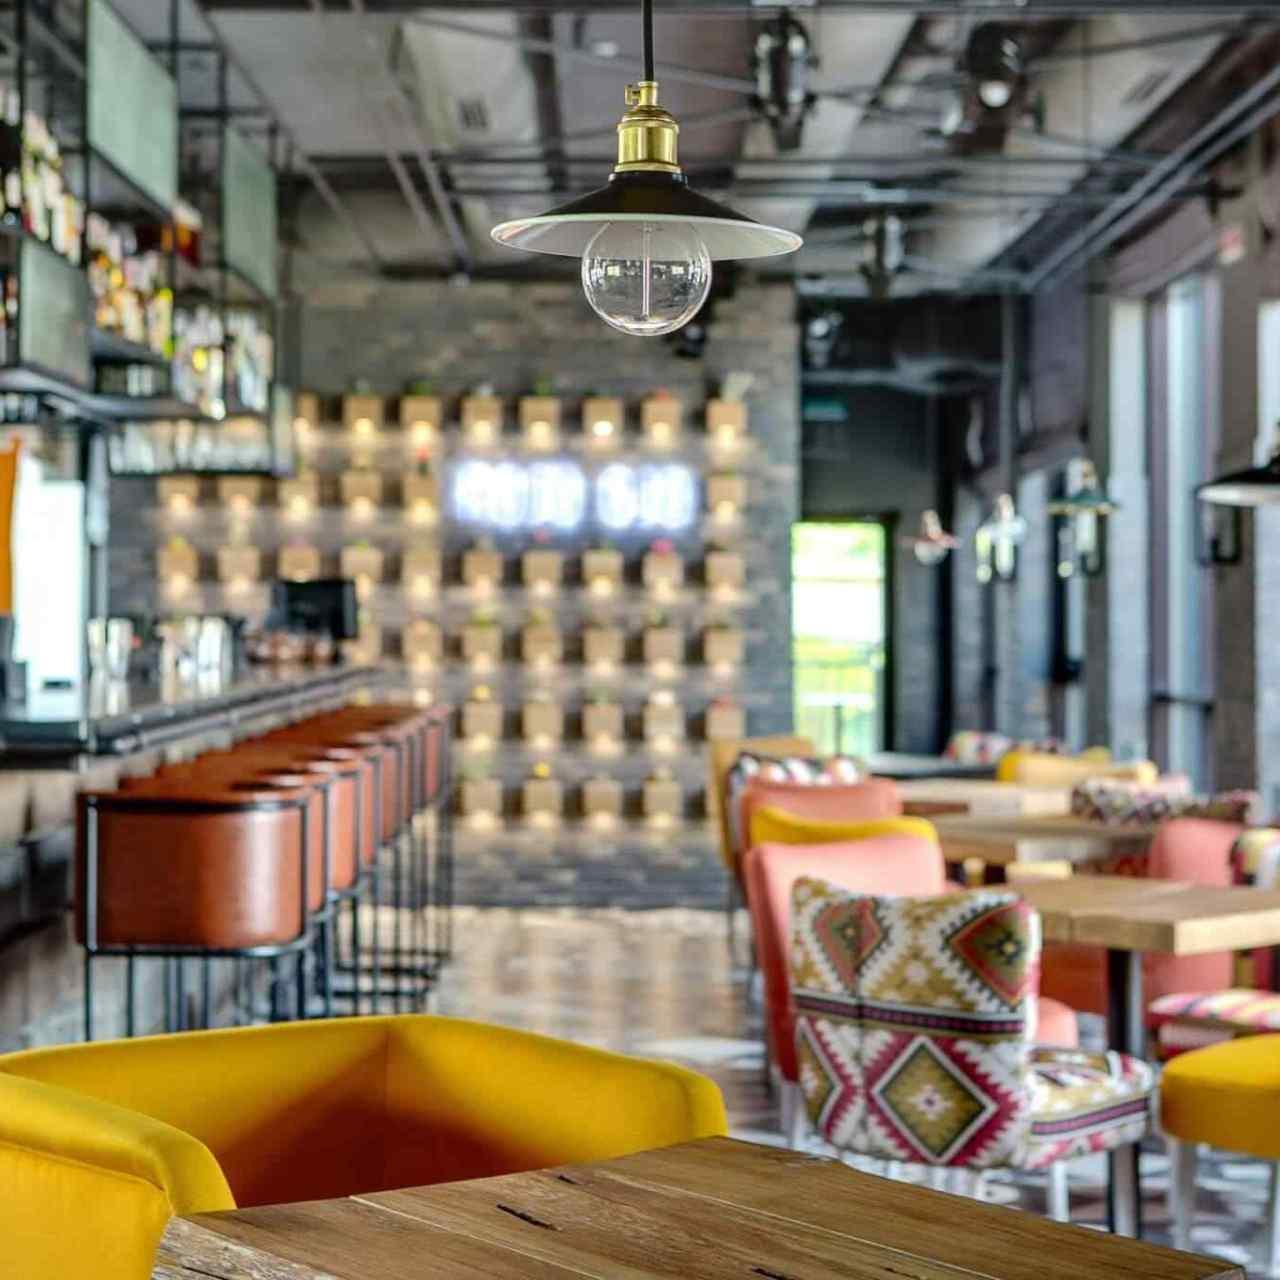 https://i1.wp.com/www.opreisinfrankrijk.nl/wp-content/uploads/2017/10/restaurant-mexican-16.jpg?resize=1280%2C1280&ssl=1